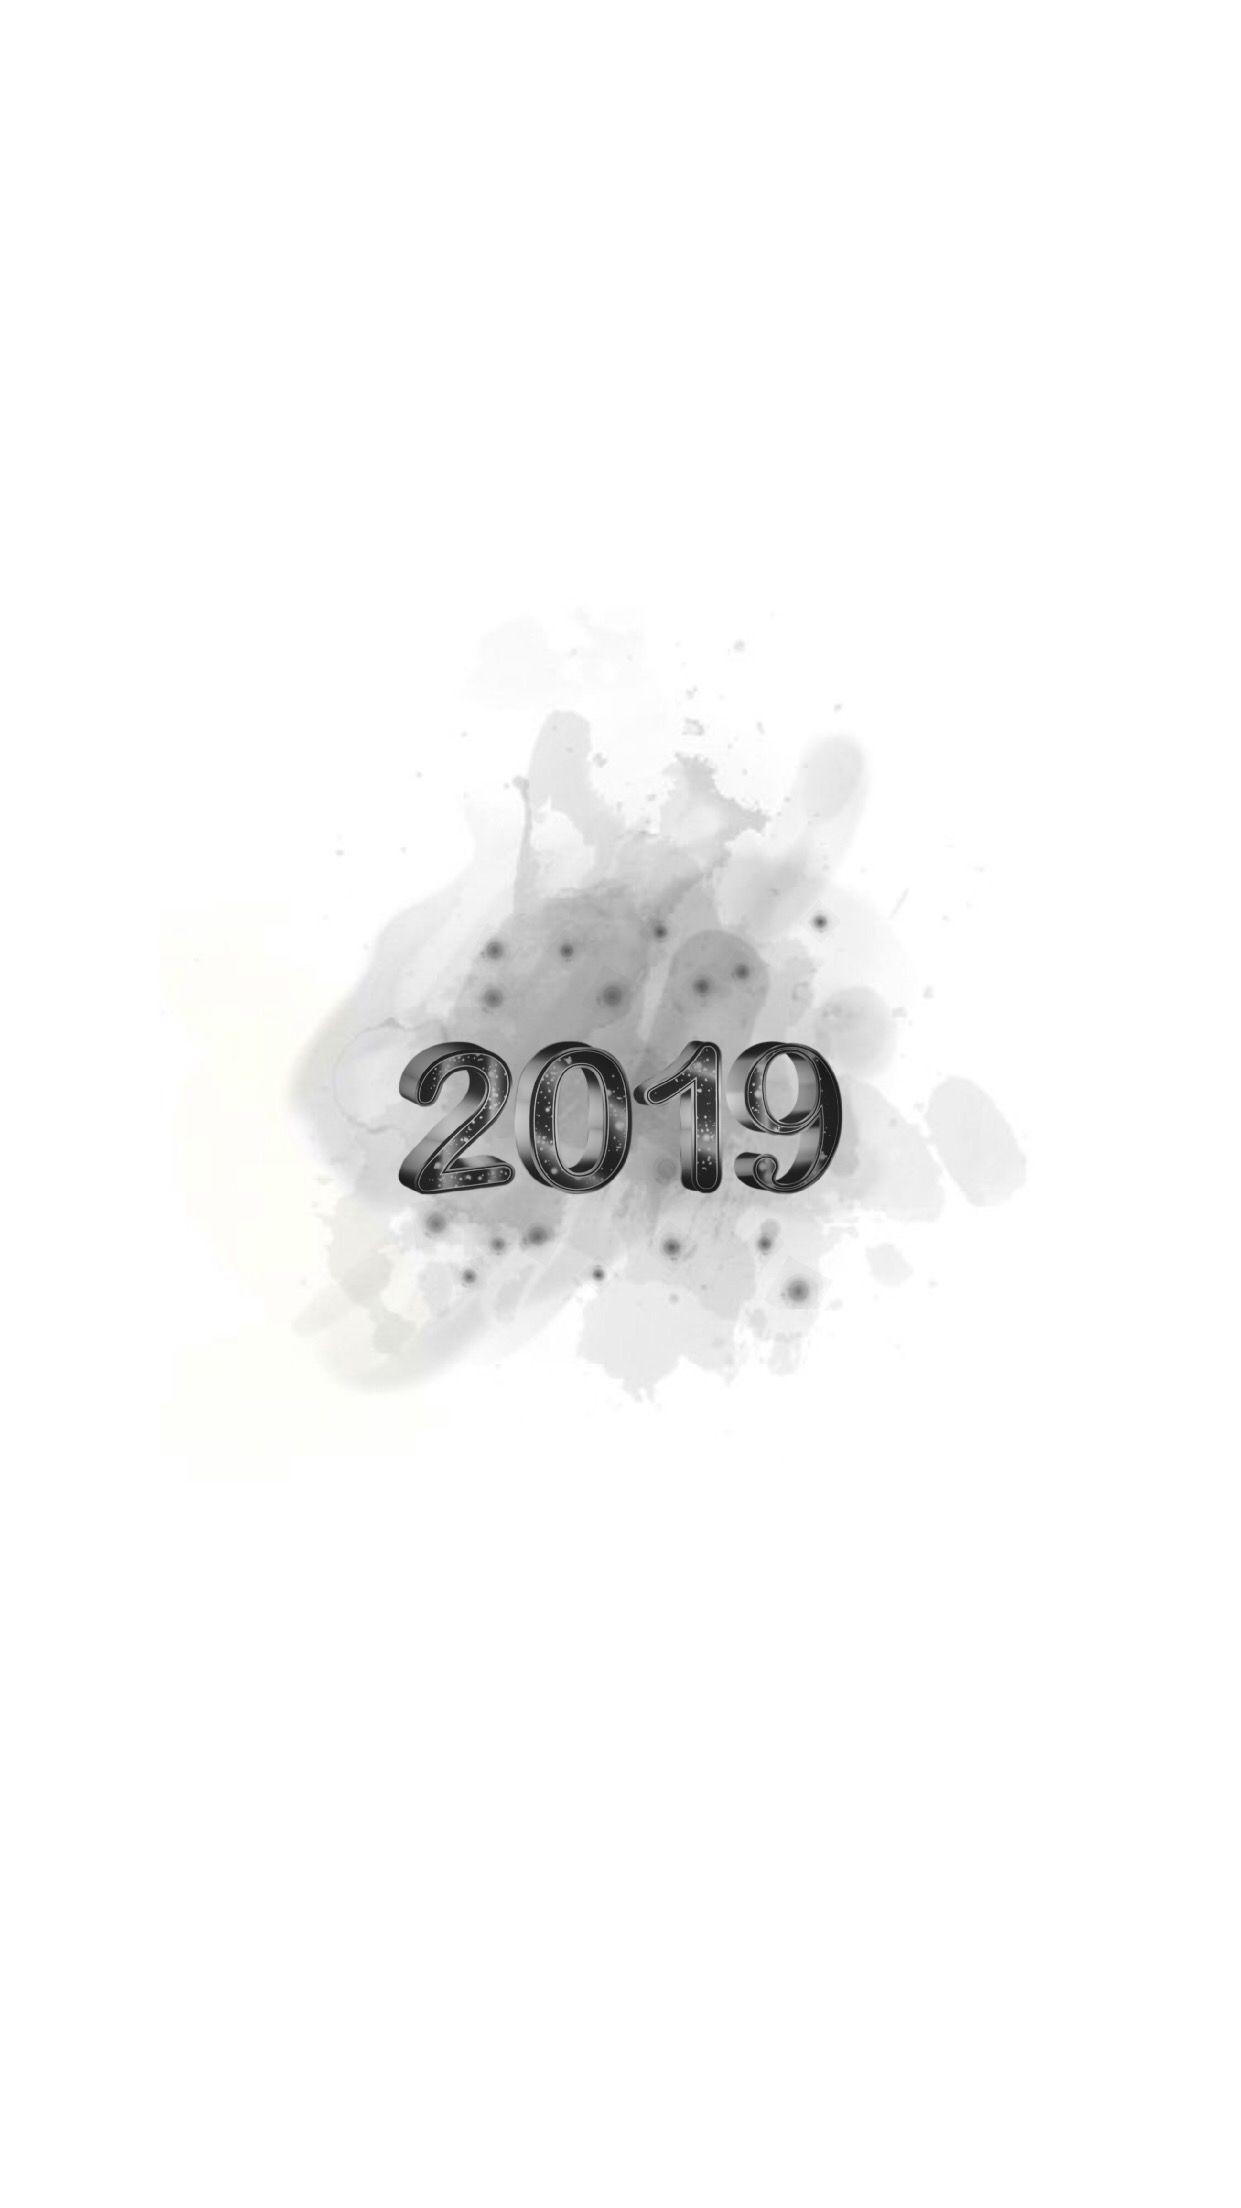 Instagramhighlights Instagramhighlights 2020 Goruntuler Ile